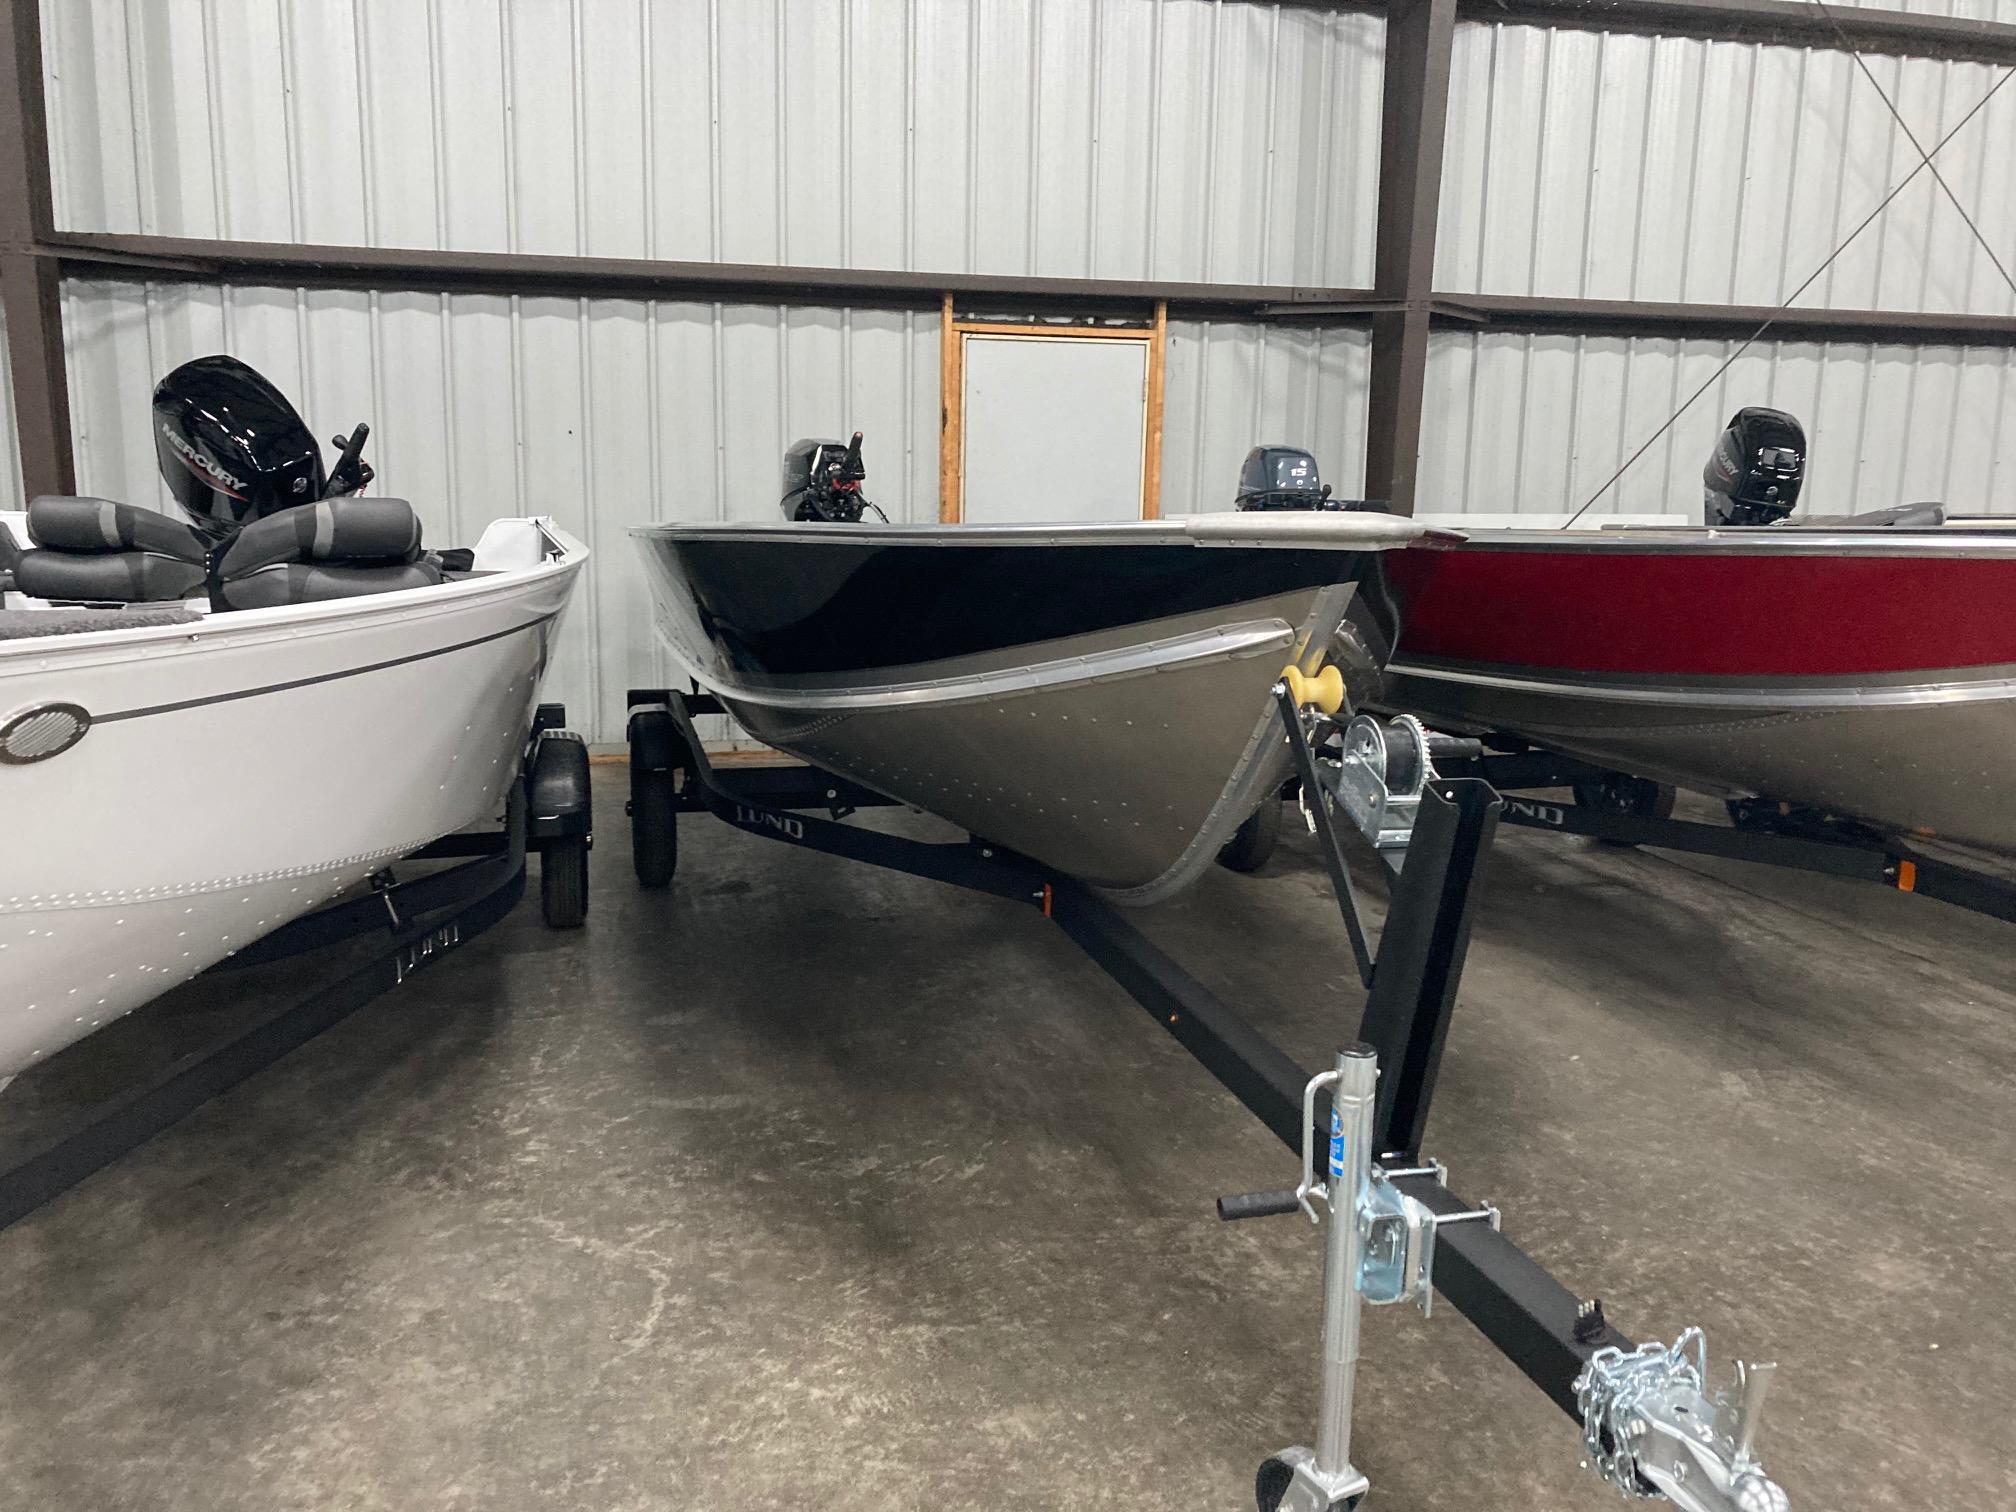 2021 Lund WC-16 for sale in Ham Lake, MN. Rapid Marine